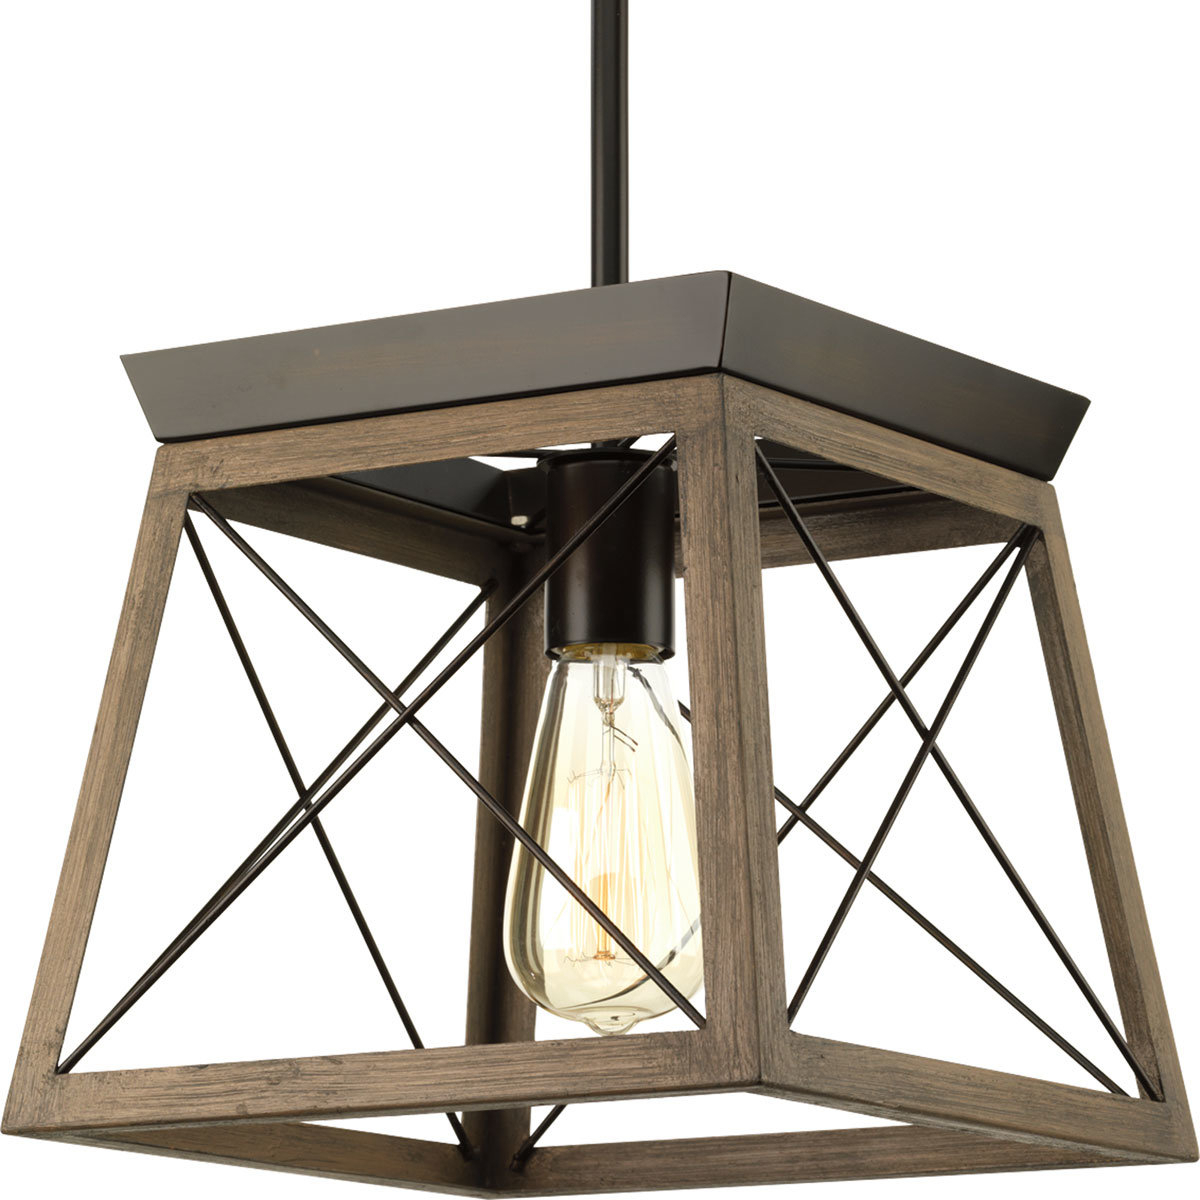 Delon 1 Light Lantern Geometric Pendants Within Widely Used Delon 1 Light Lantern Geometric Pendant (View 7 of 20)